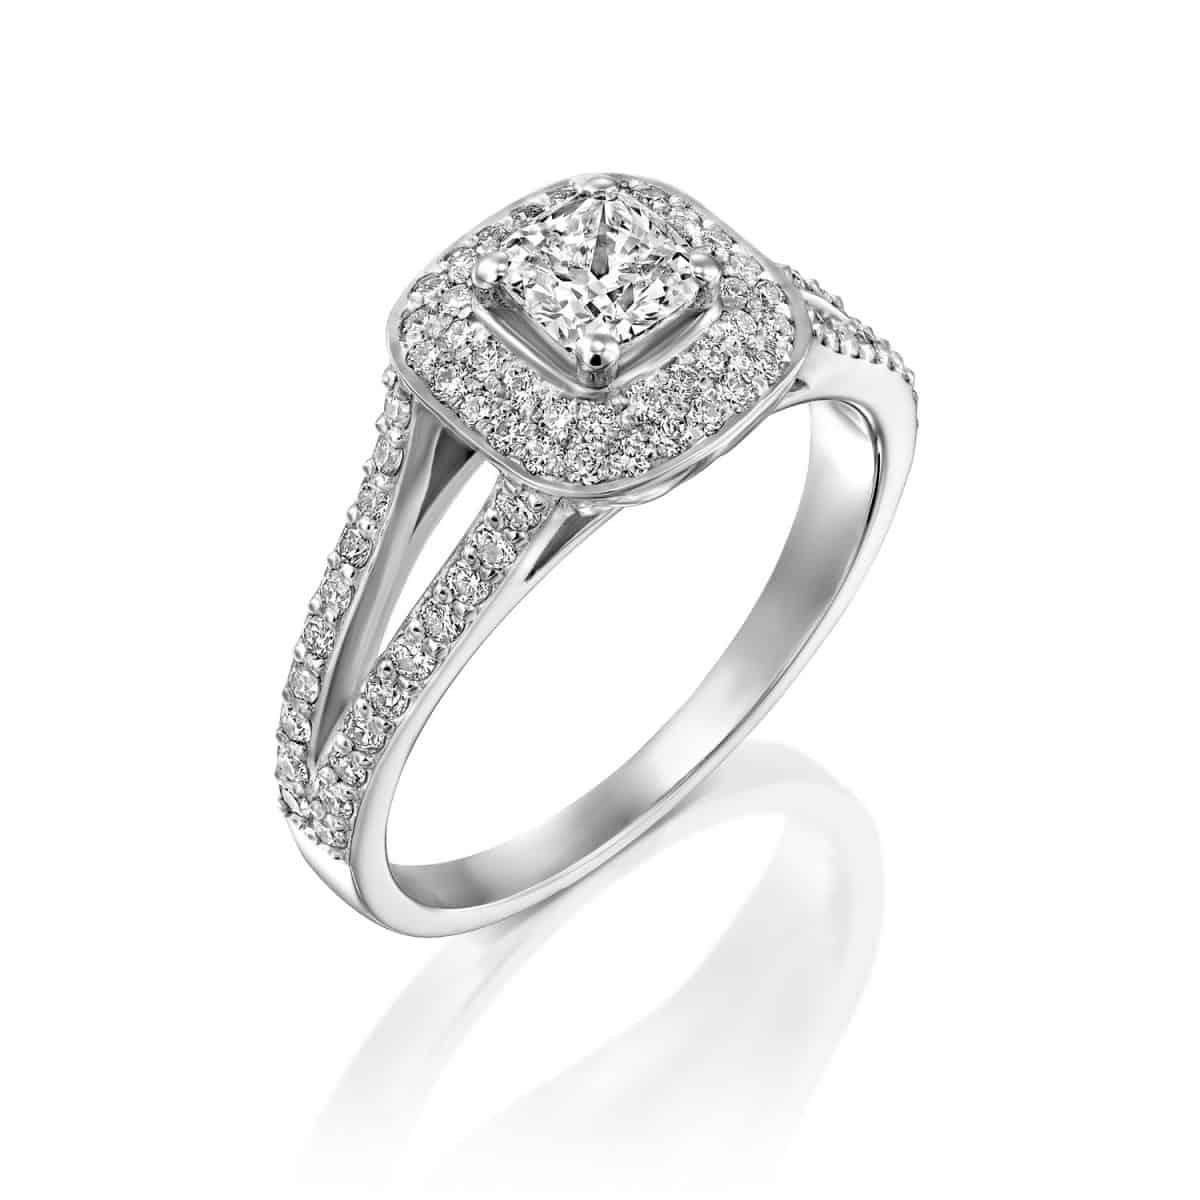 "1.41 carat diamond engagement ring ""Alexis"""